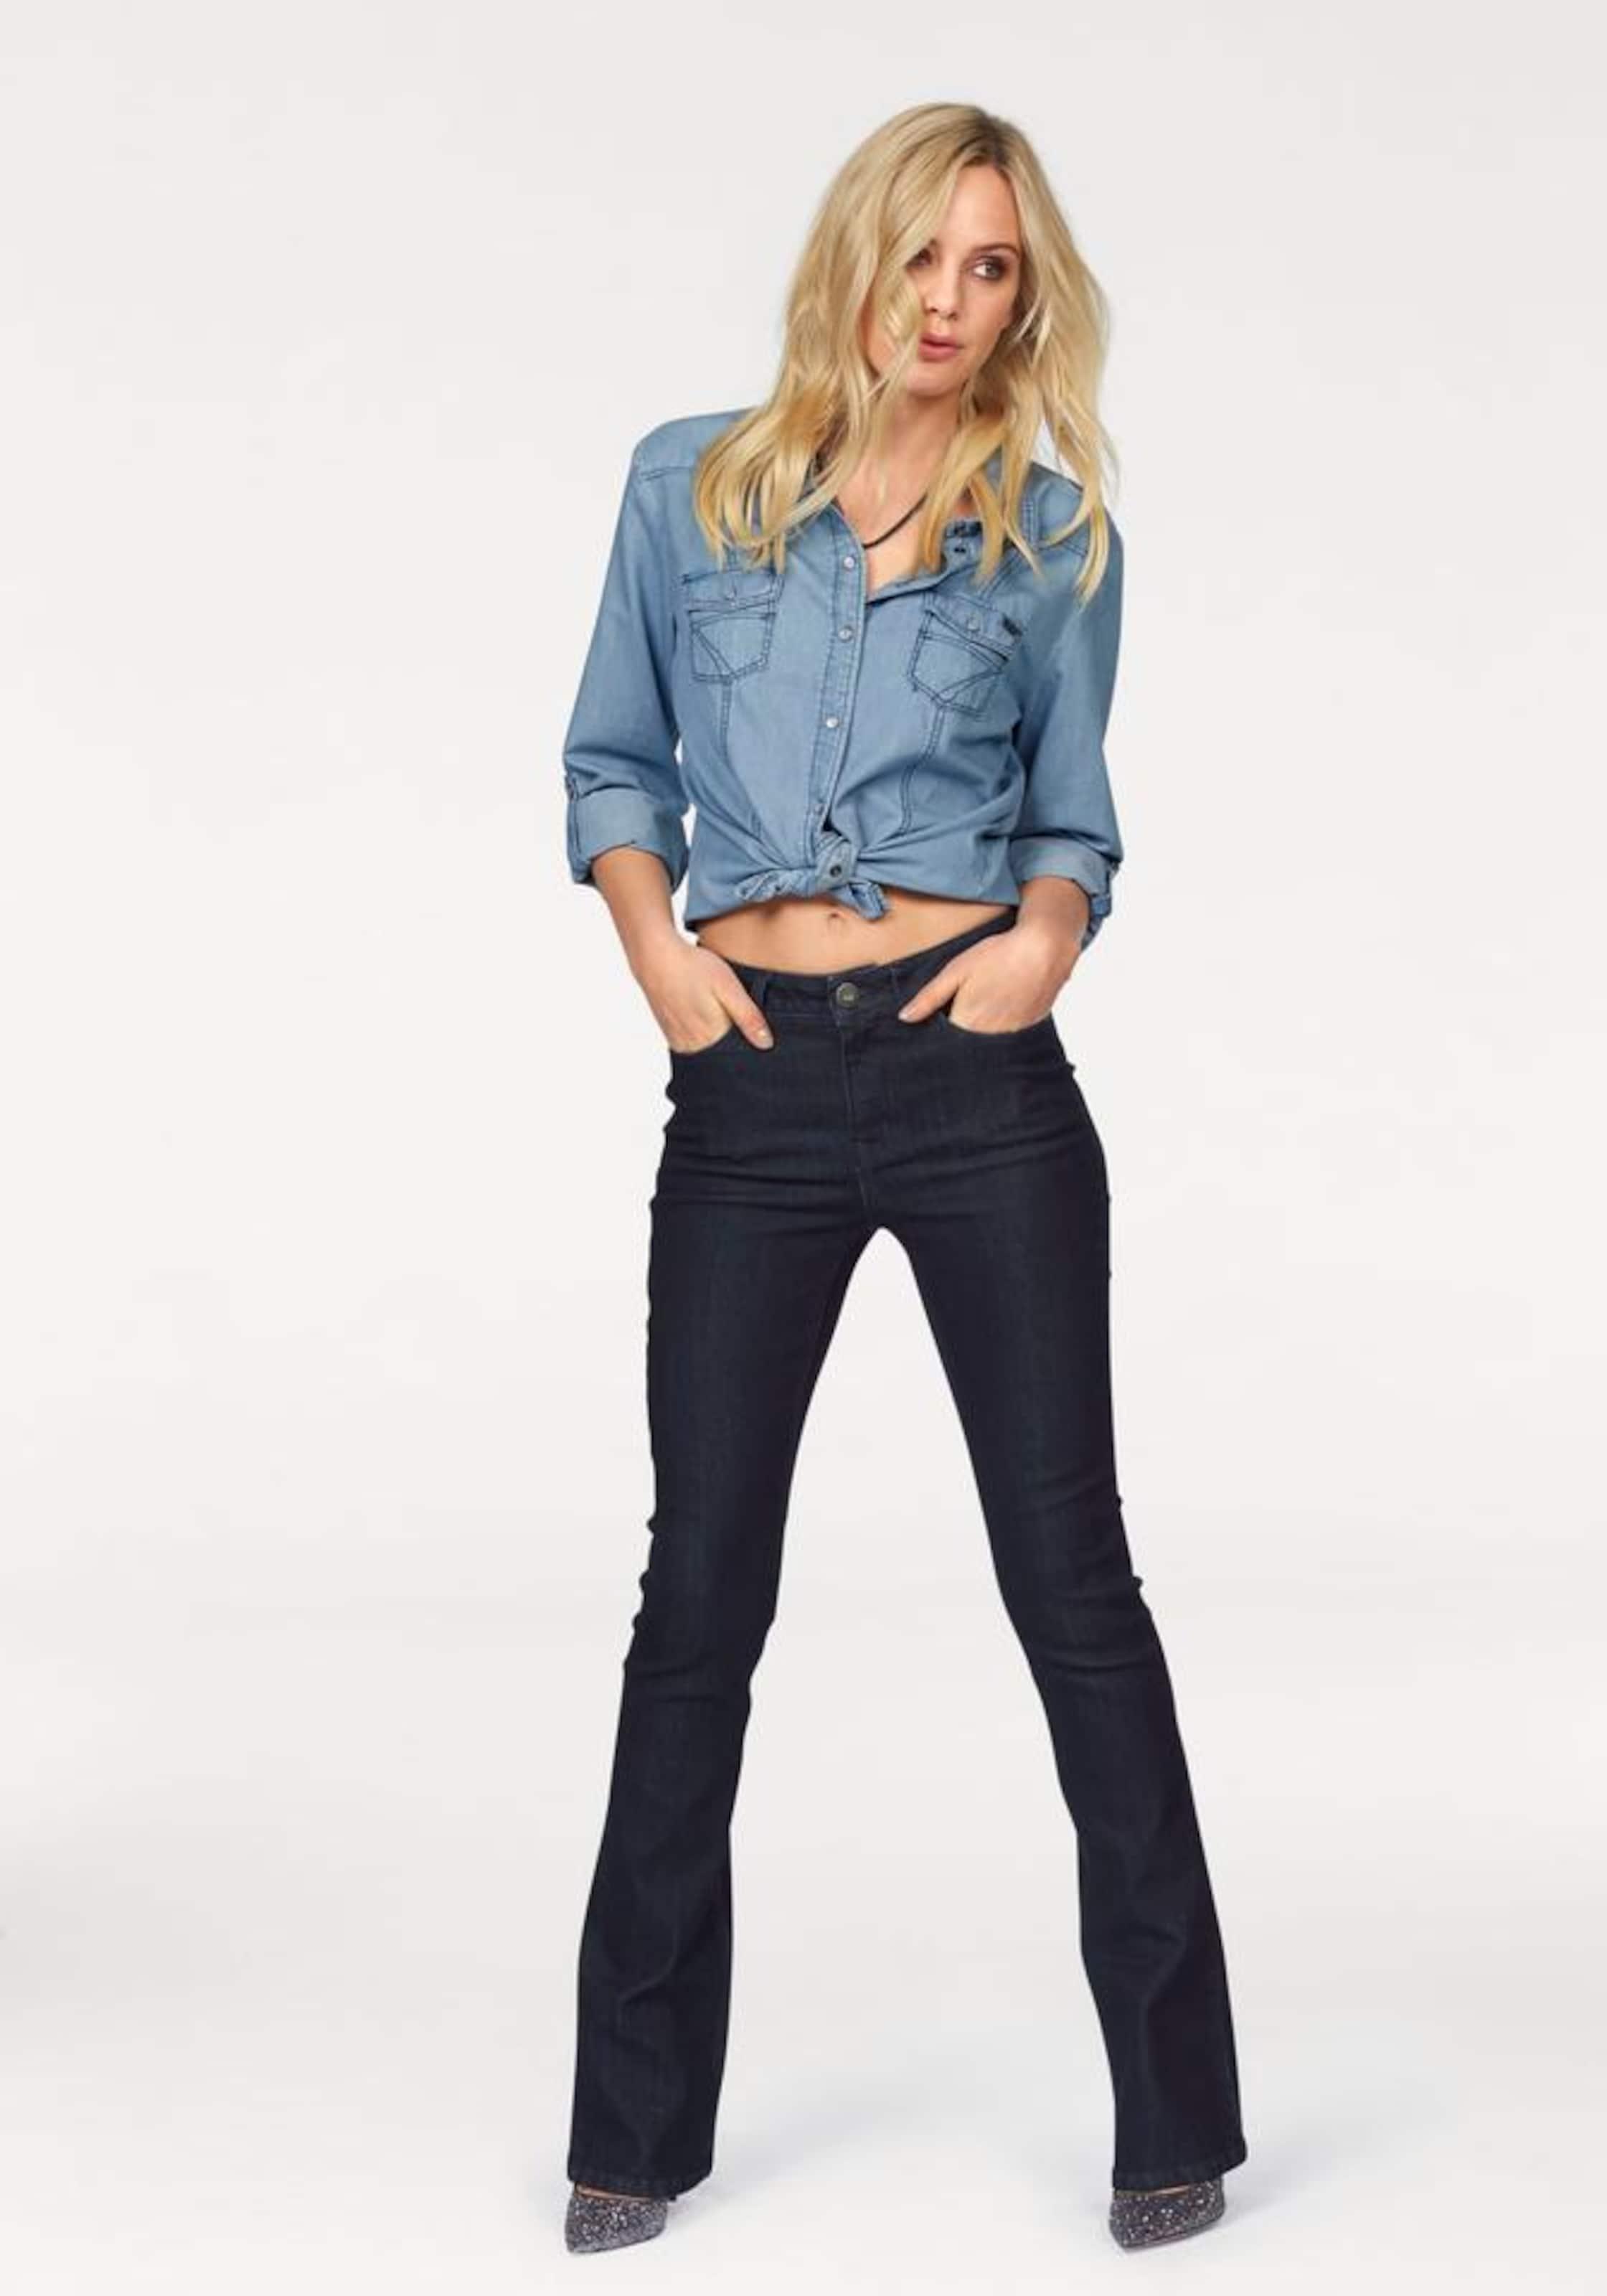 Arizona Jeans Jeans In Jeans Nachtblau In 'bootcut' 'bootcut' In 'bootcut' Arizona Arizona Nachtblau g7Yf6by